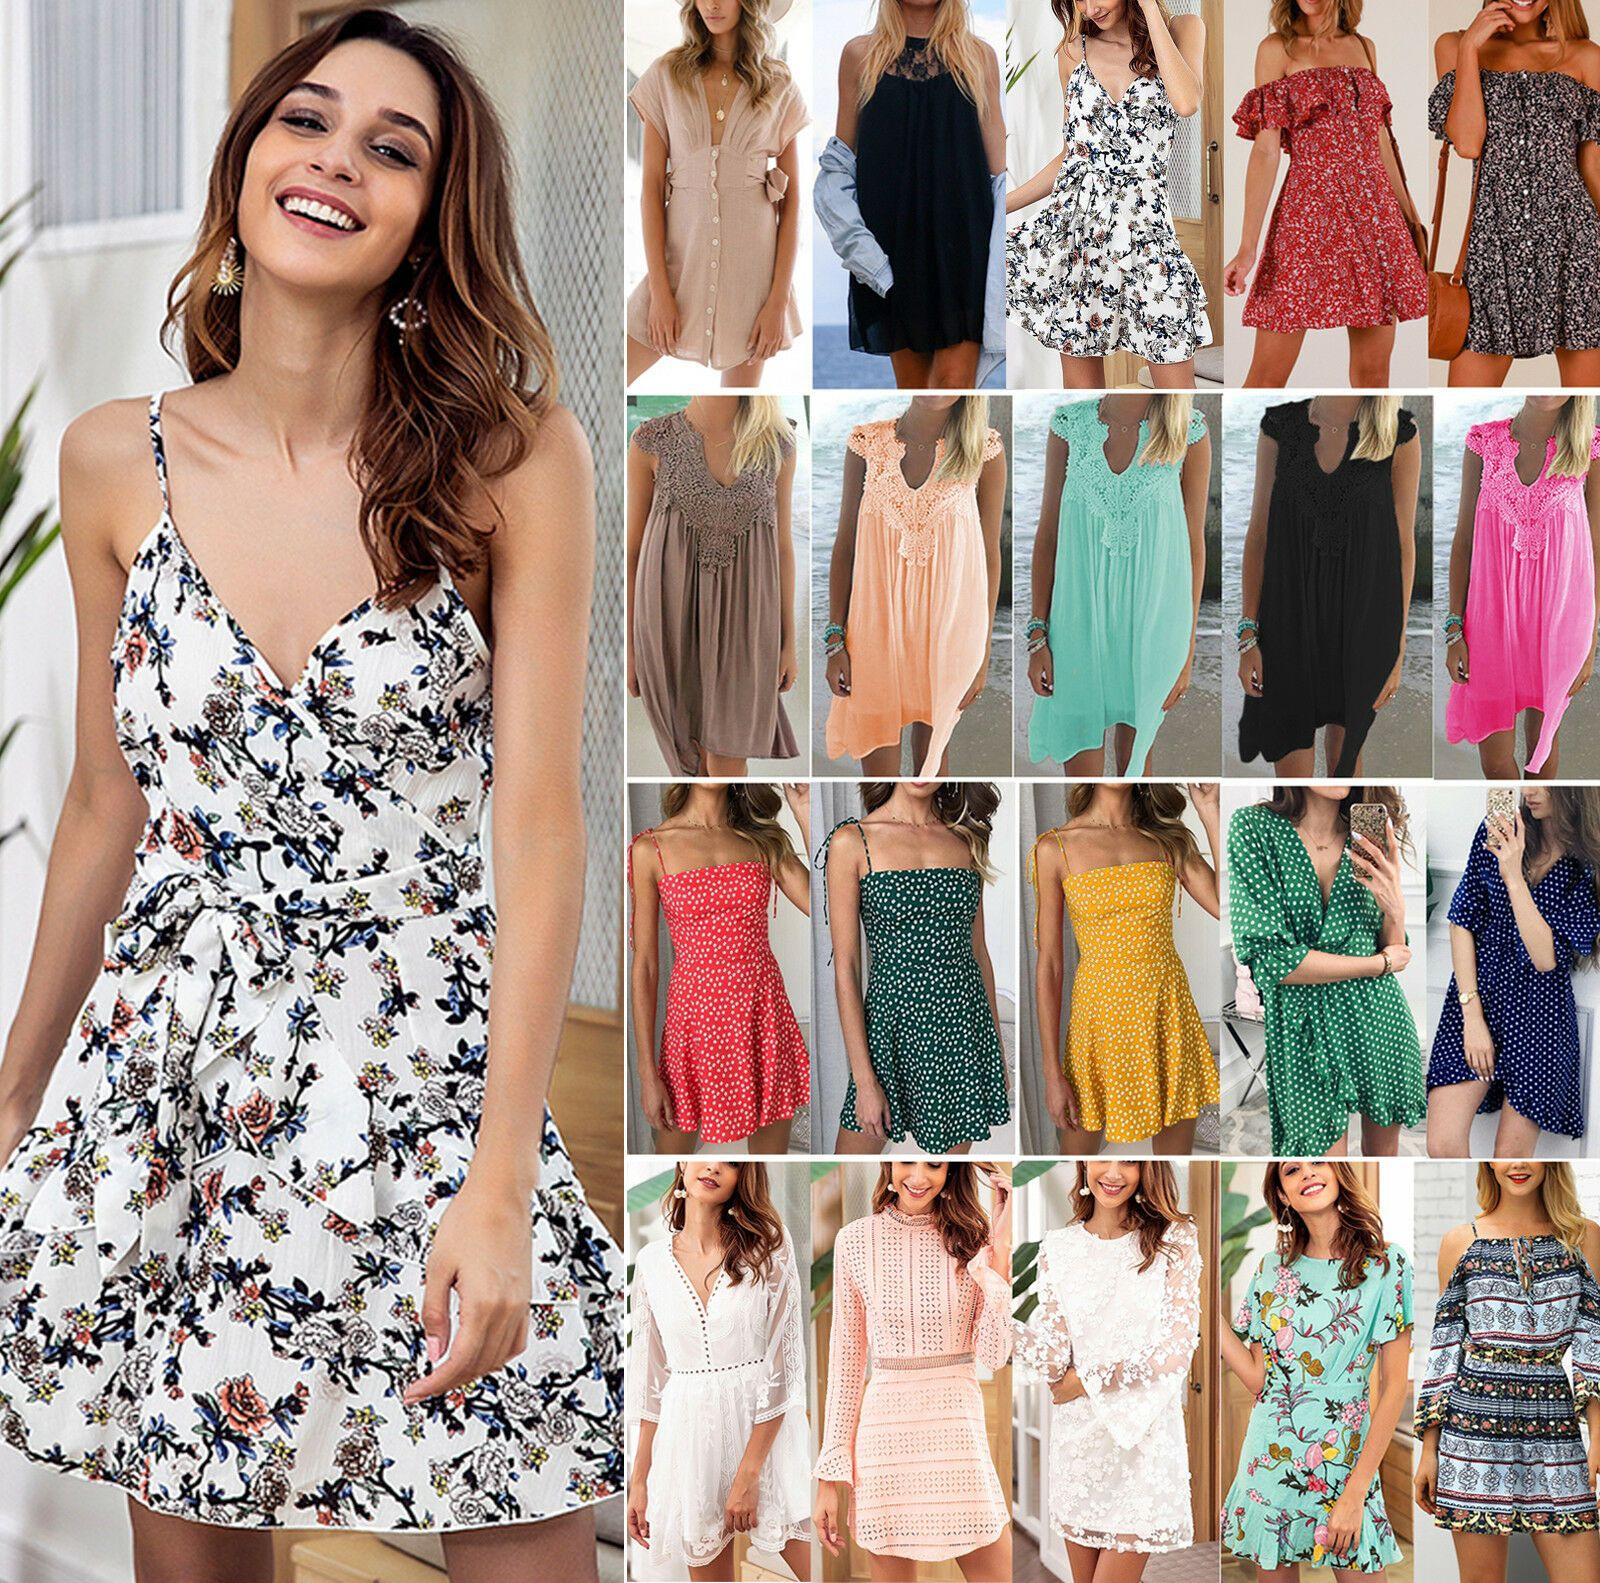 15 Perfekt Kleid Damen Kurz Ärmel10 Schön Kleid Damen Kurz Vertrieb